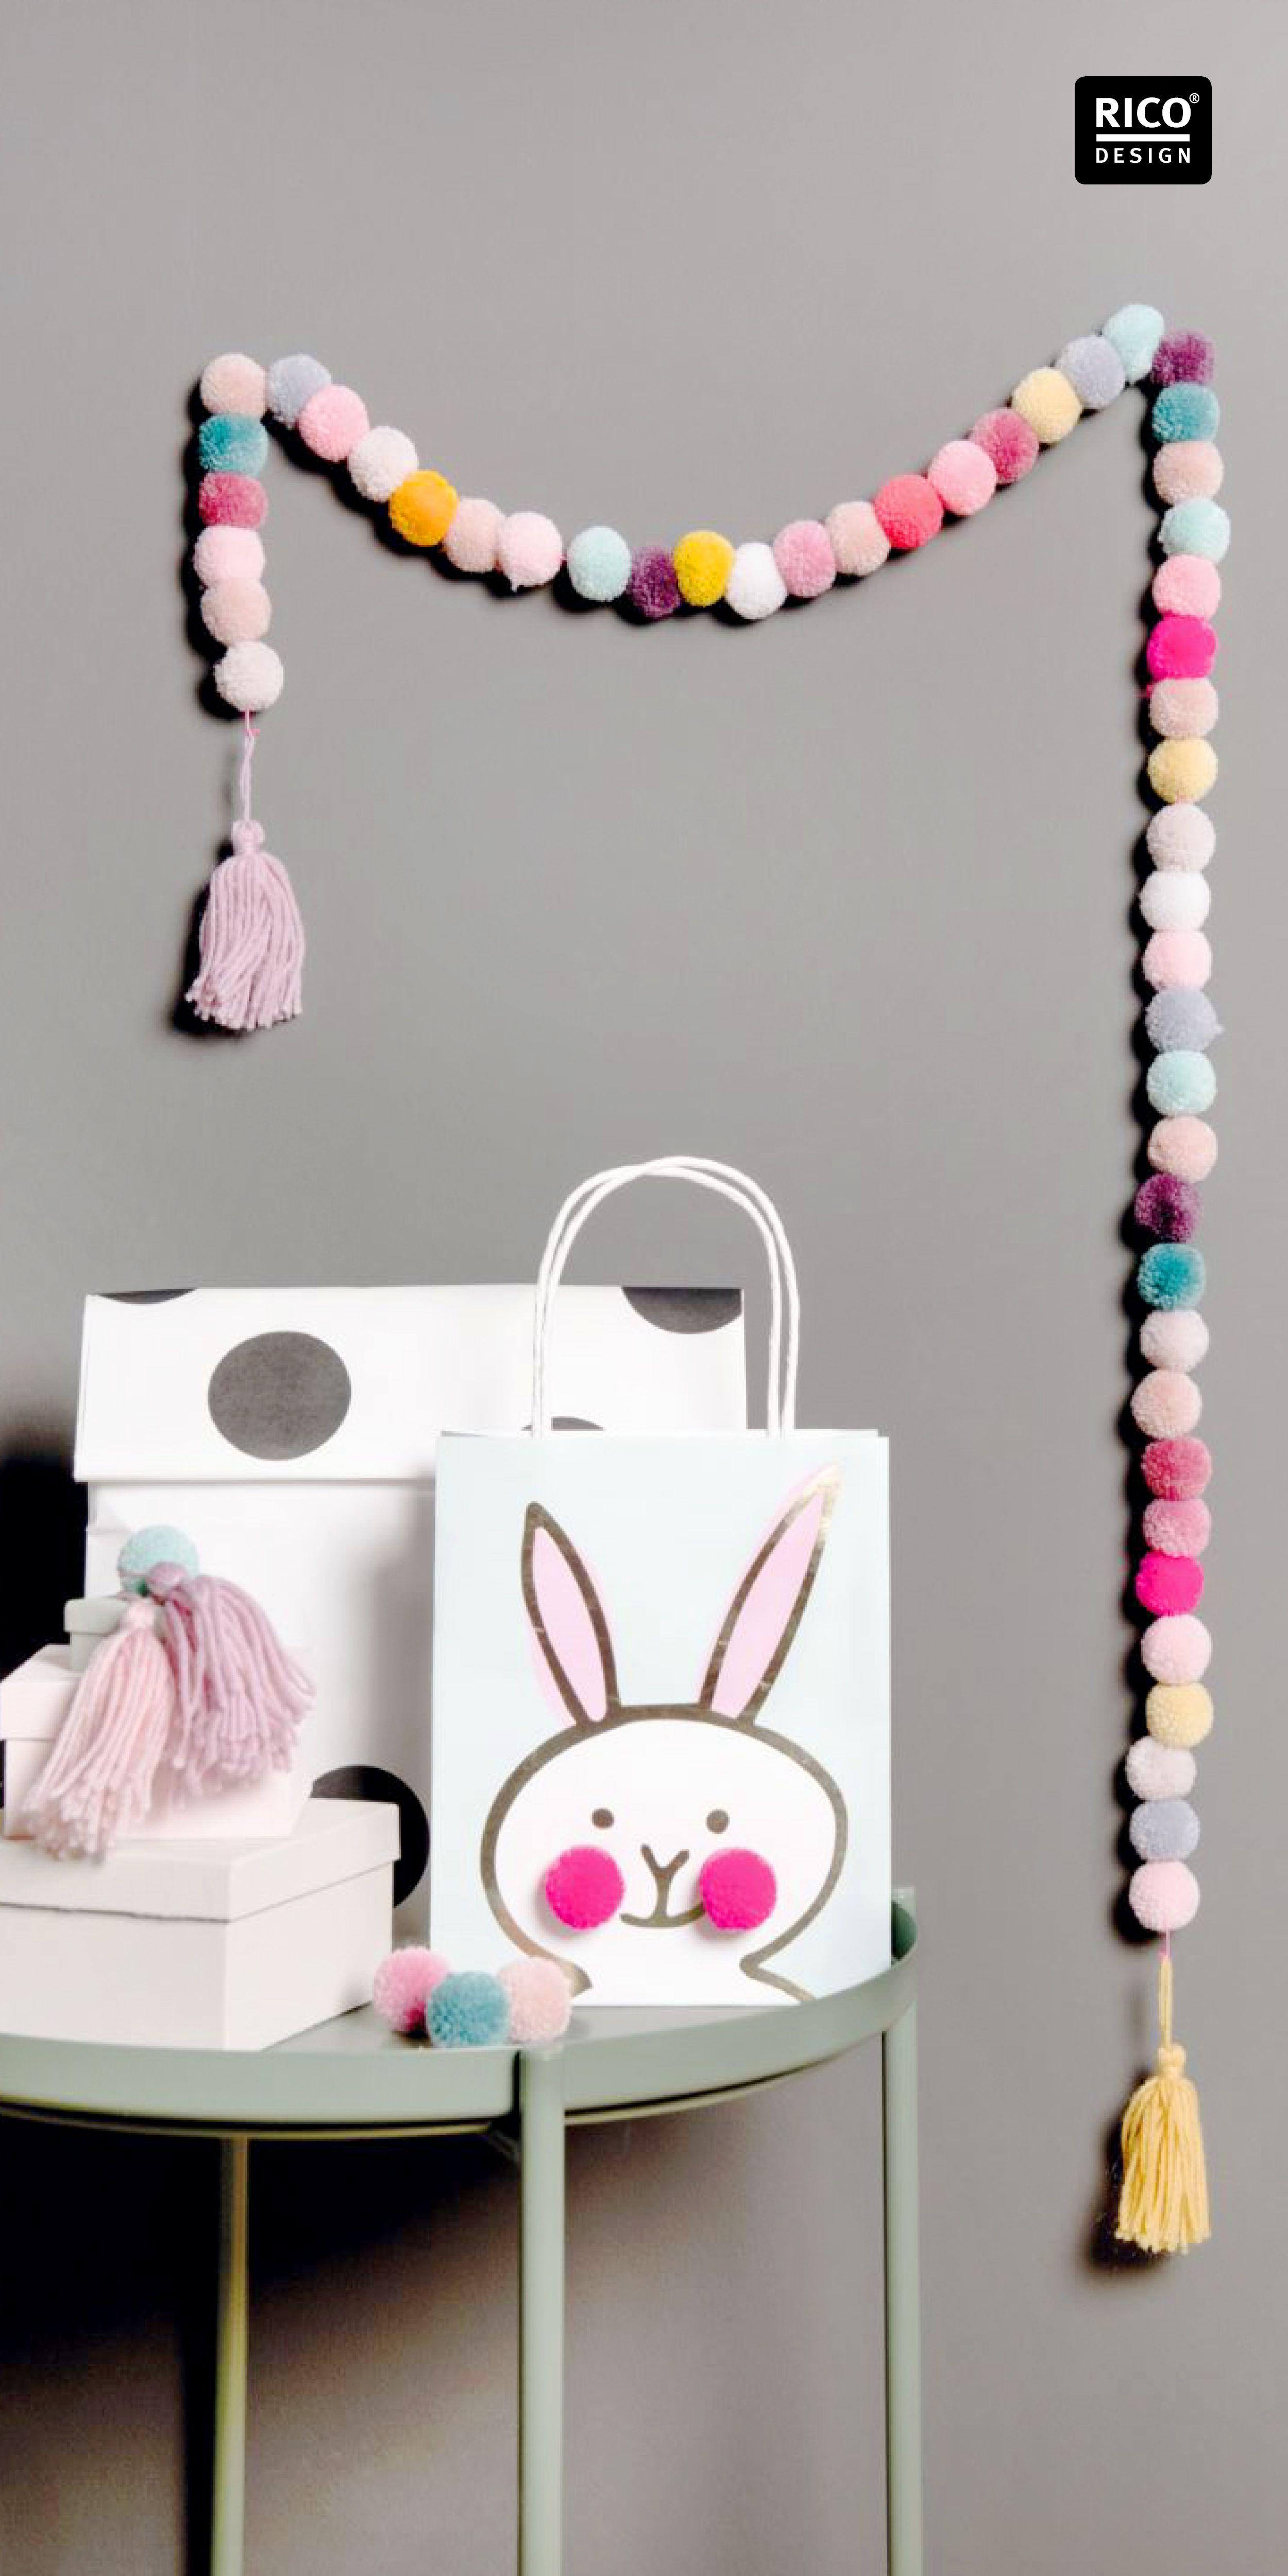 Dekorative Girlande Aus Pompons Und Quasten Selber Basteln Yarn Pom Pom Pom Pom Mobile Pom Pom Projects